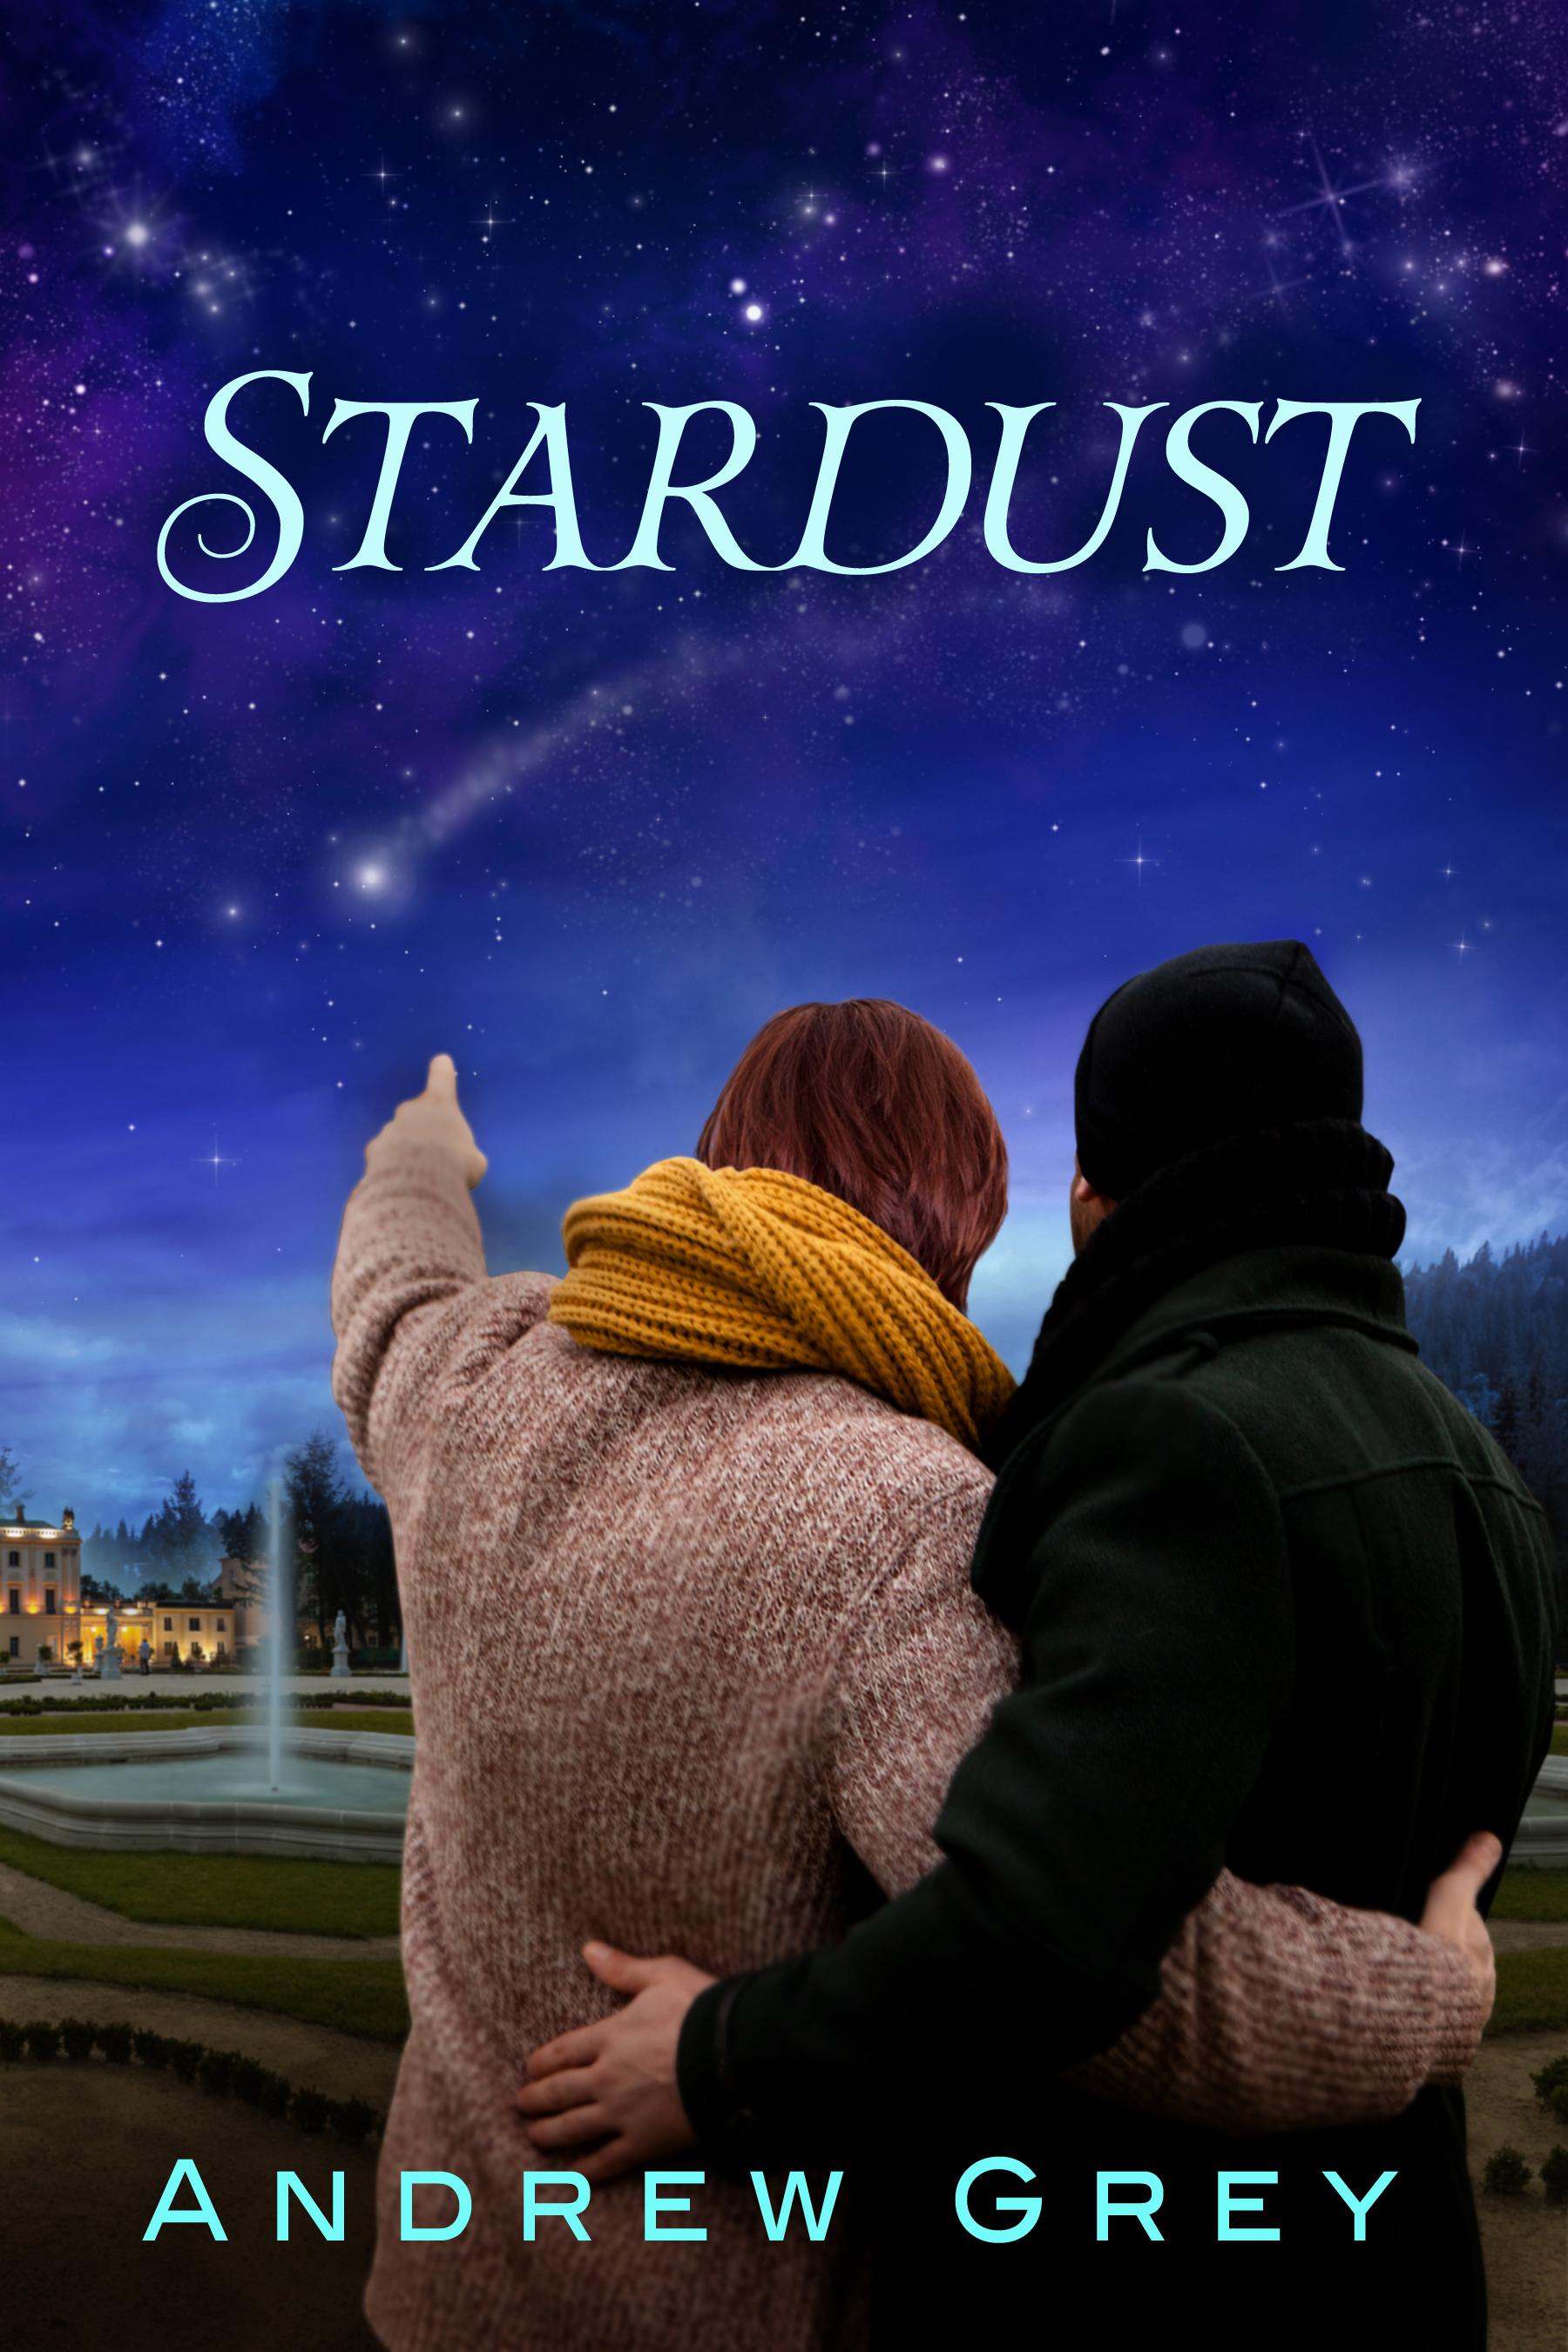 Stardust-build